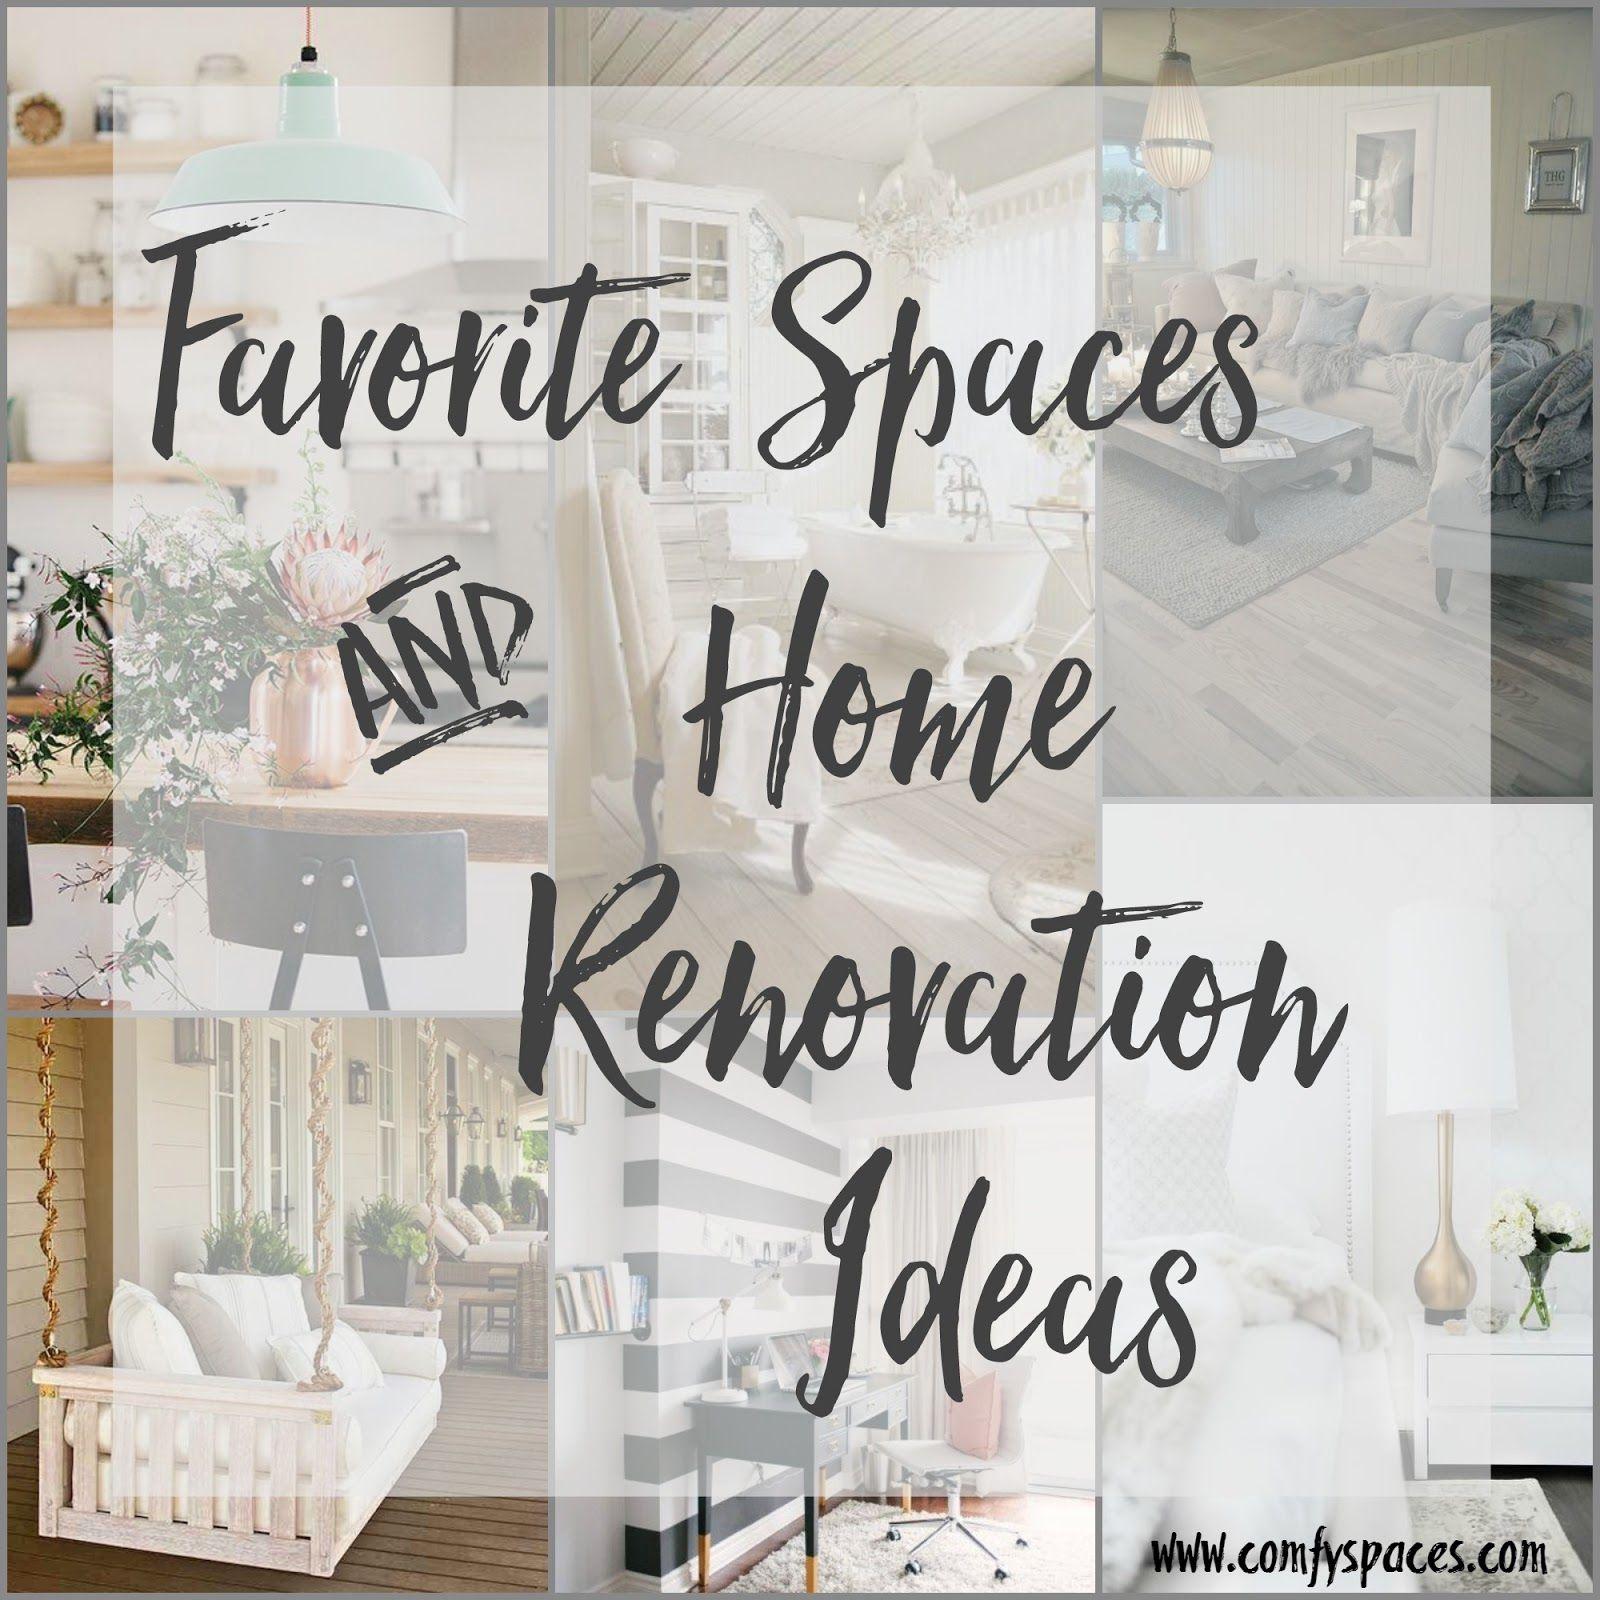 Comfortable Spaces: Favorite Spaces & Home Renovation Ideas